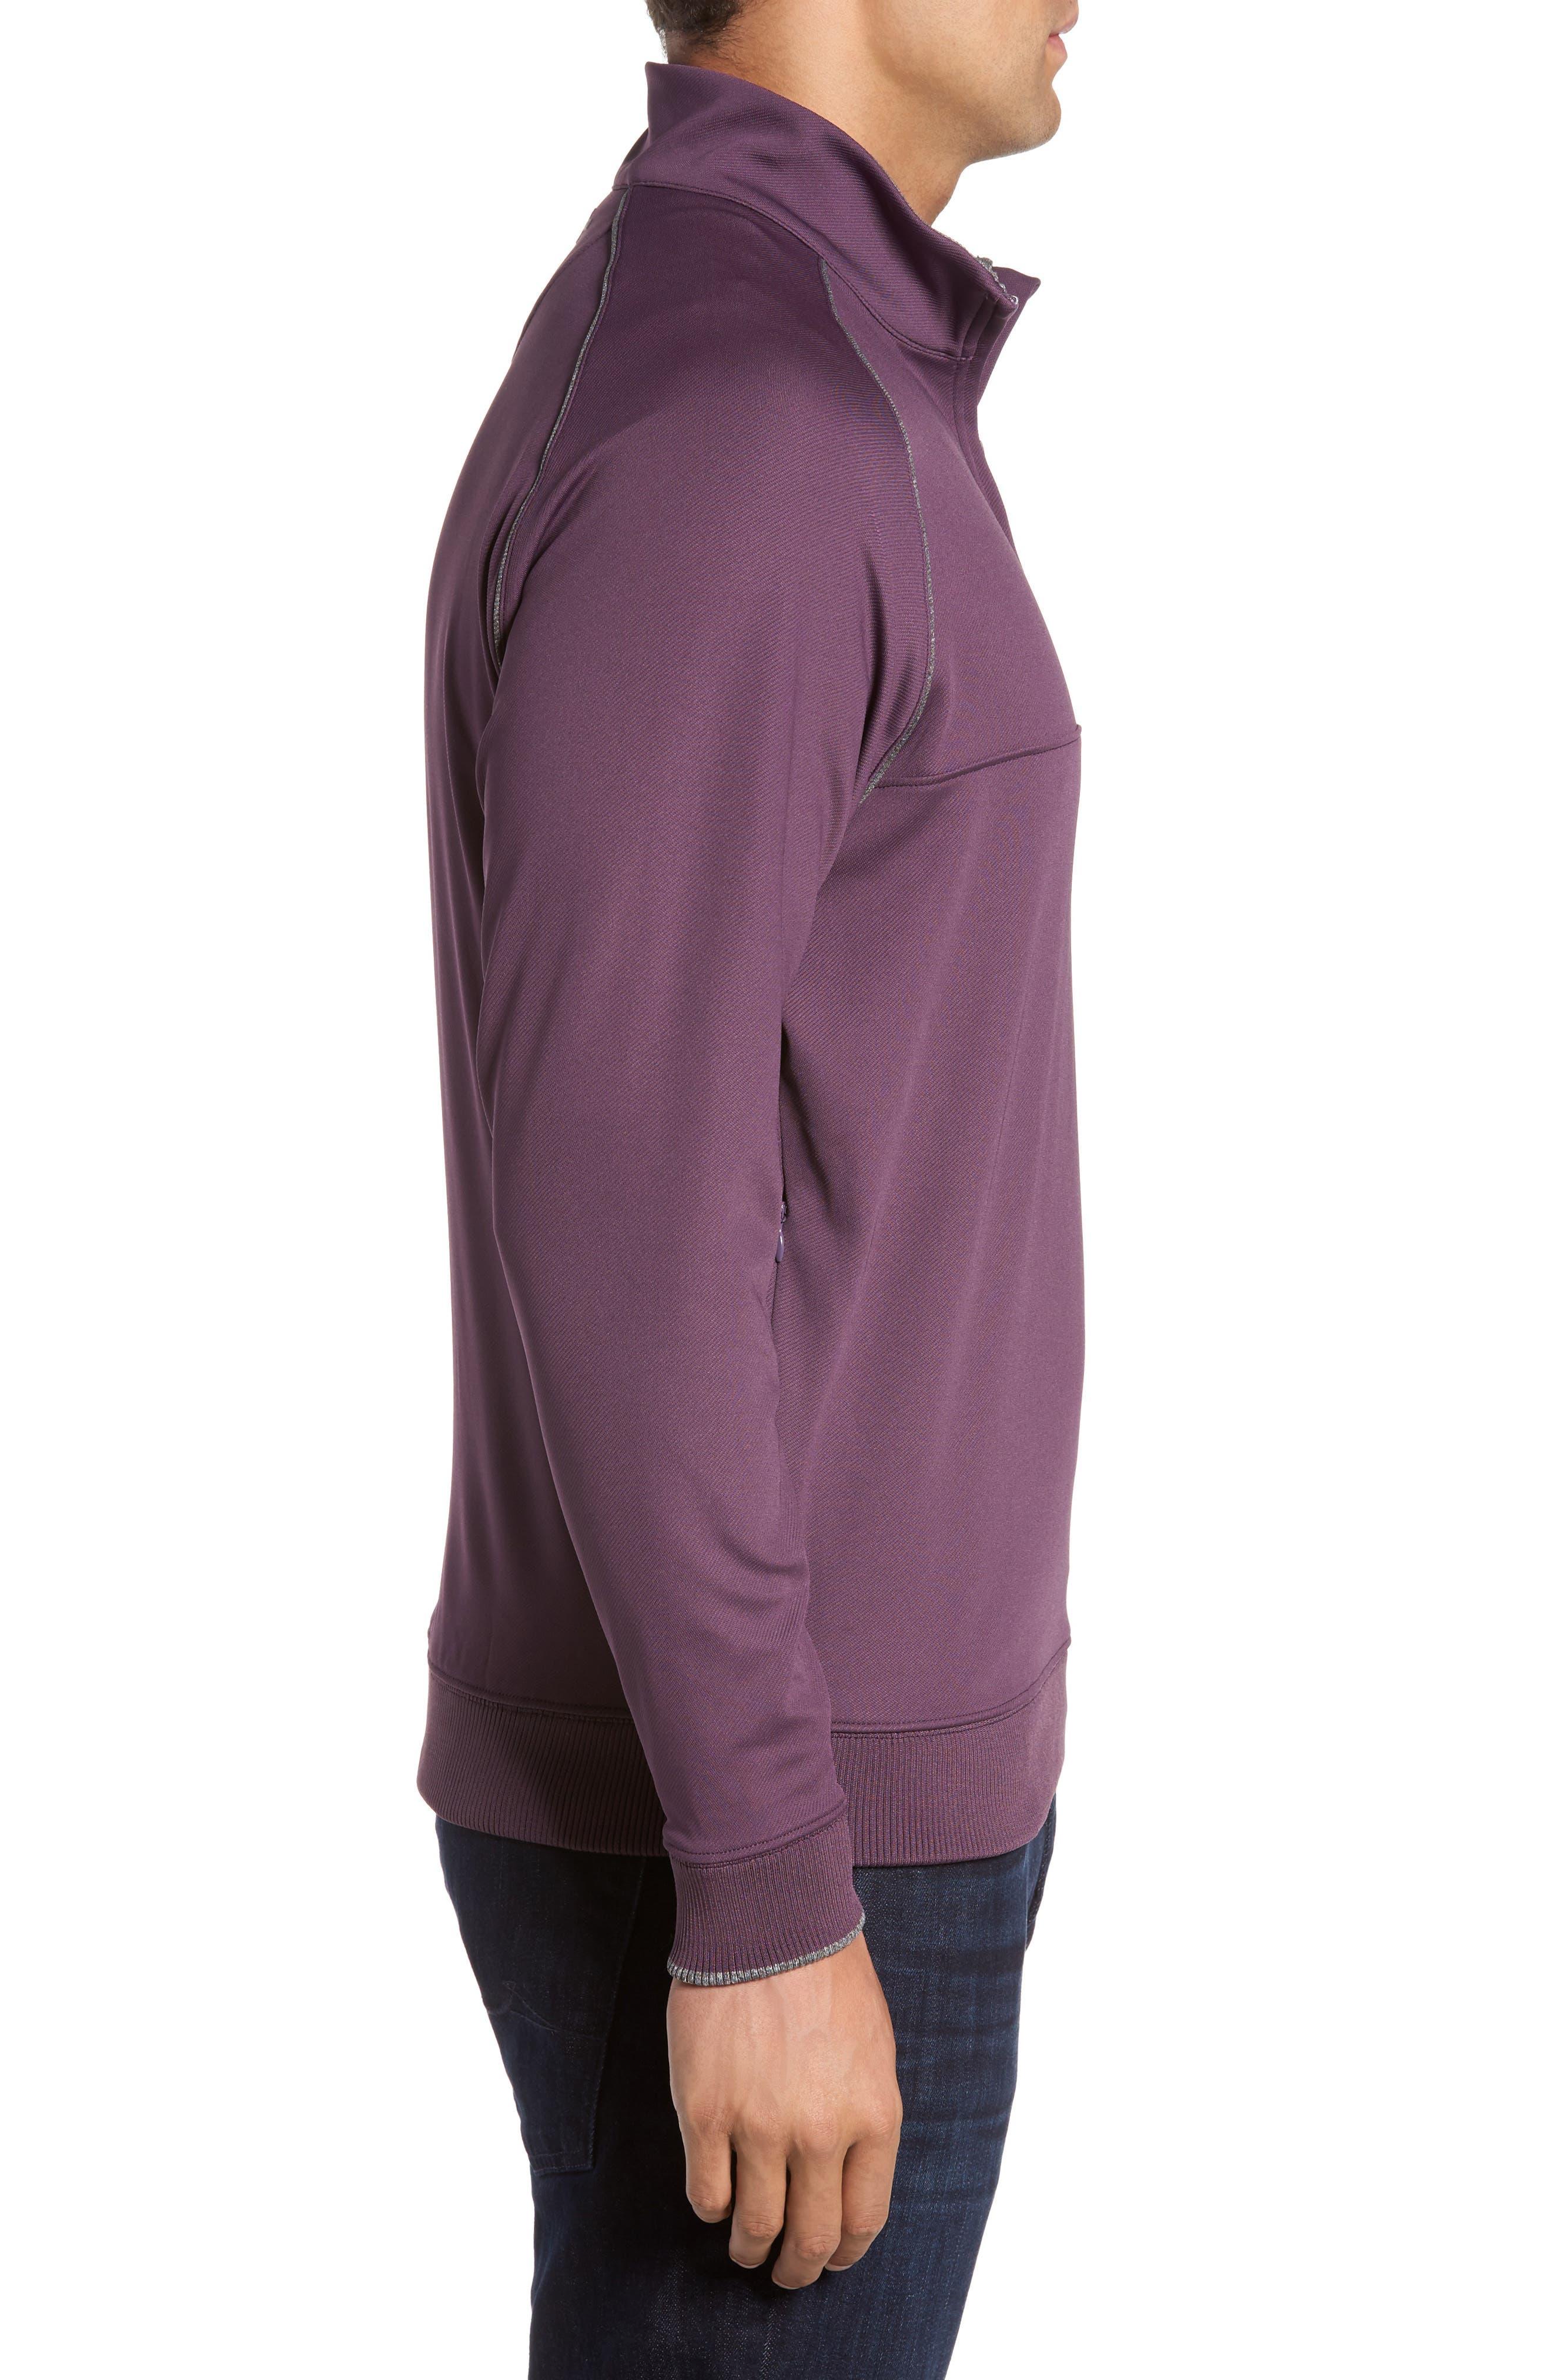 XH20 Banded Bottom Pullover,                             Alternate thumbnail 3, color,                             Blackberry